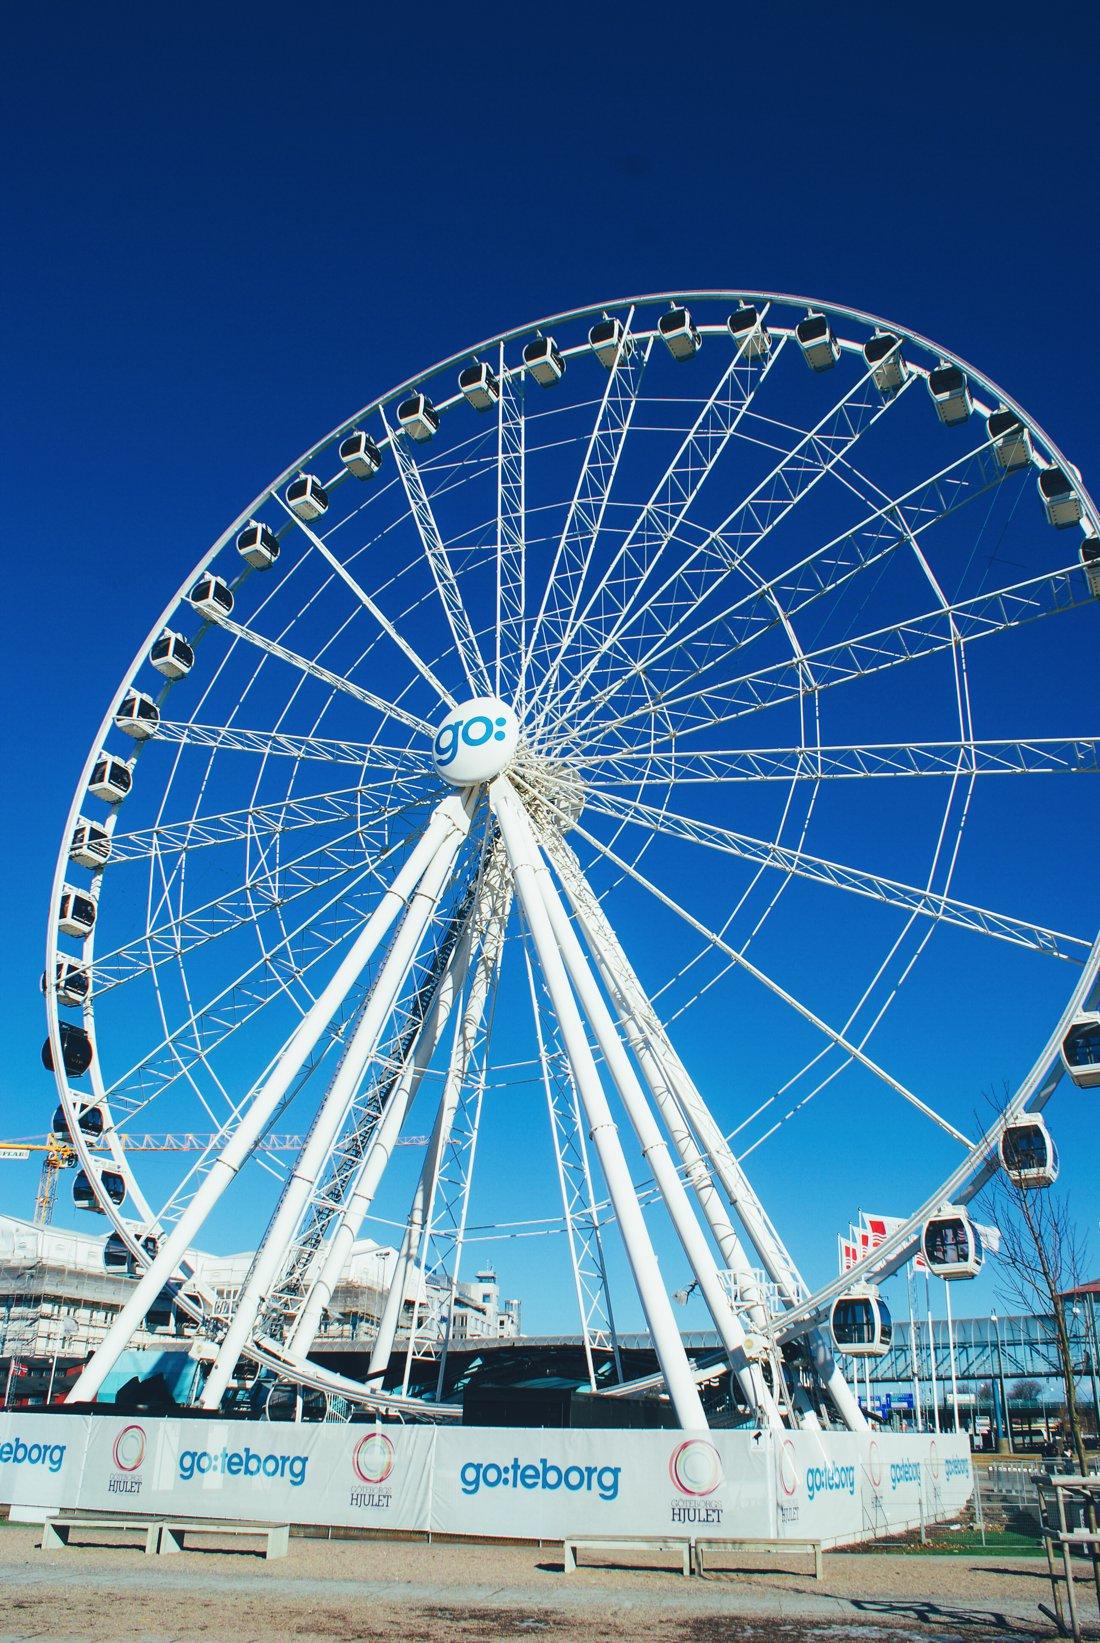 Nordic Adventures - The Sequel! Next stop - Gothenburg, Sweden! (2)